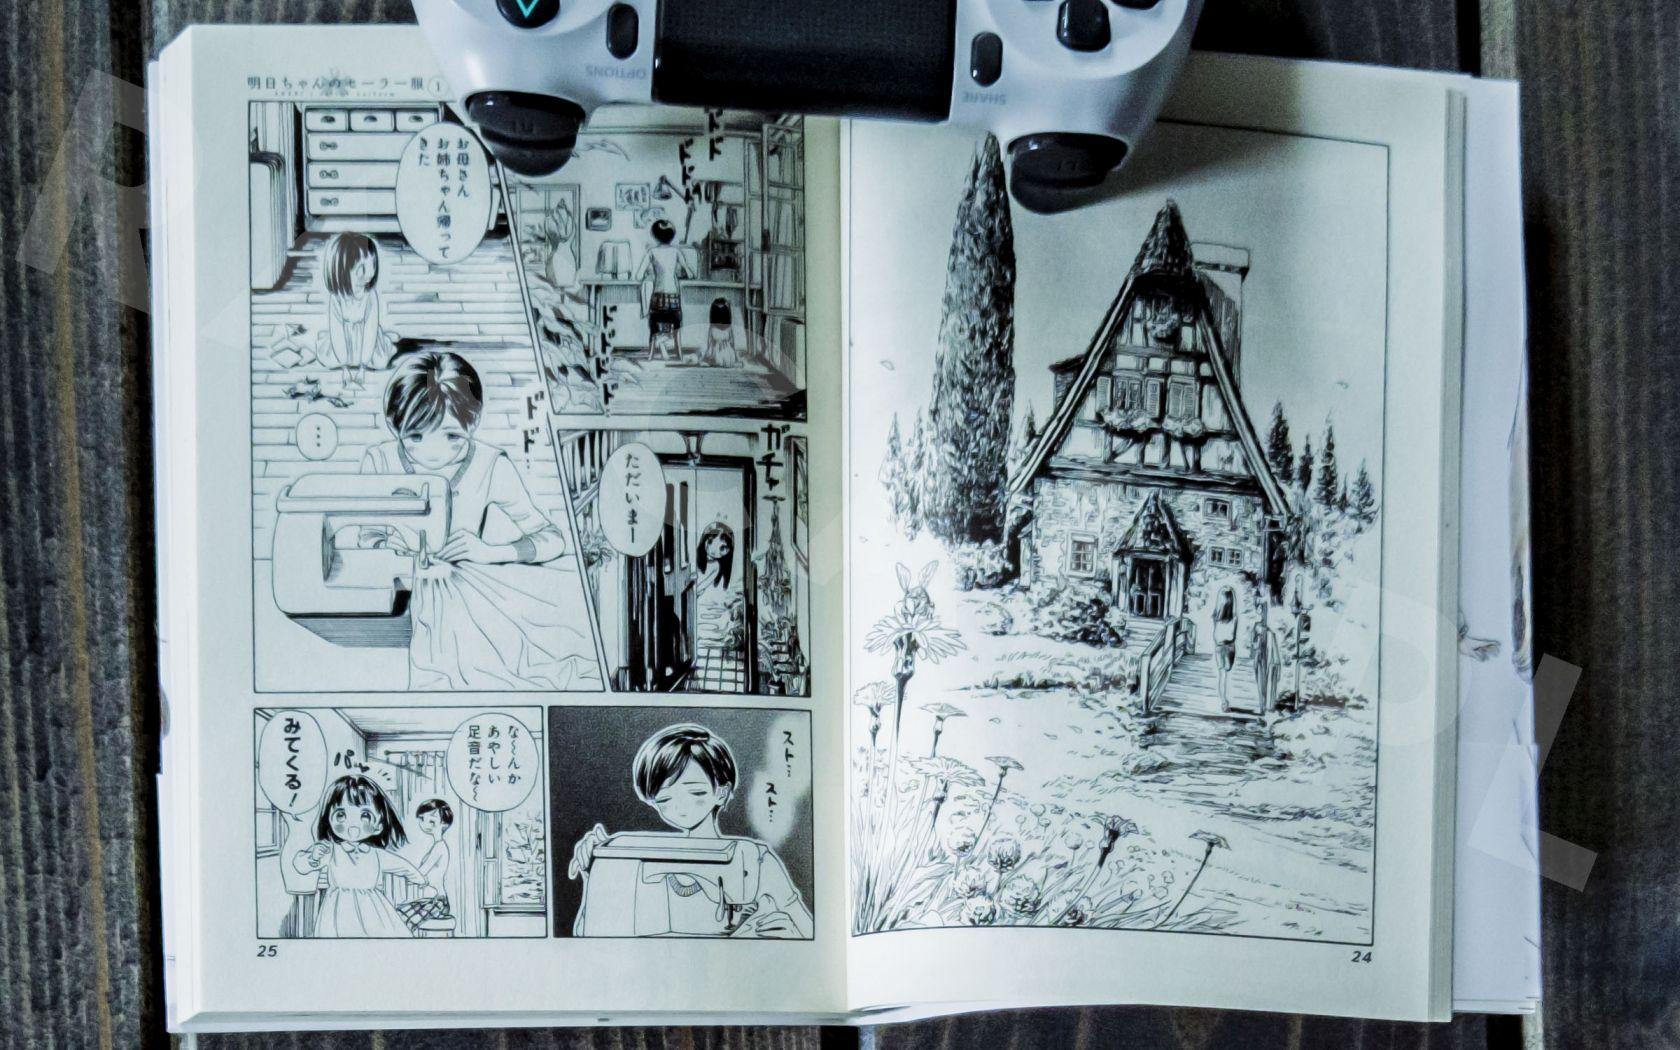 Akebi-chan no Sailor-fuku (1,2,3,4,5) - Young Jump Comics - Nowości w kolekcji mangi (listopad 2020) - rascal.pl